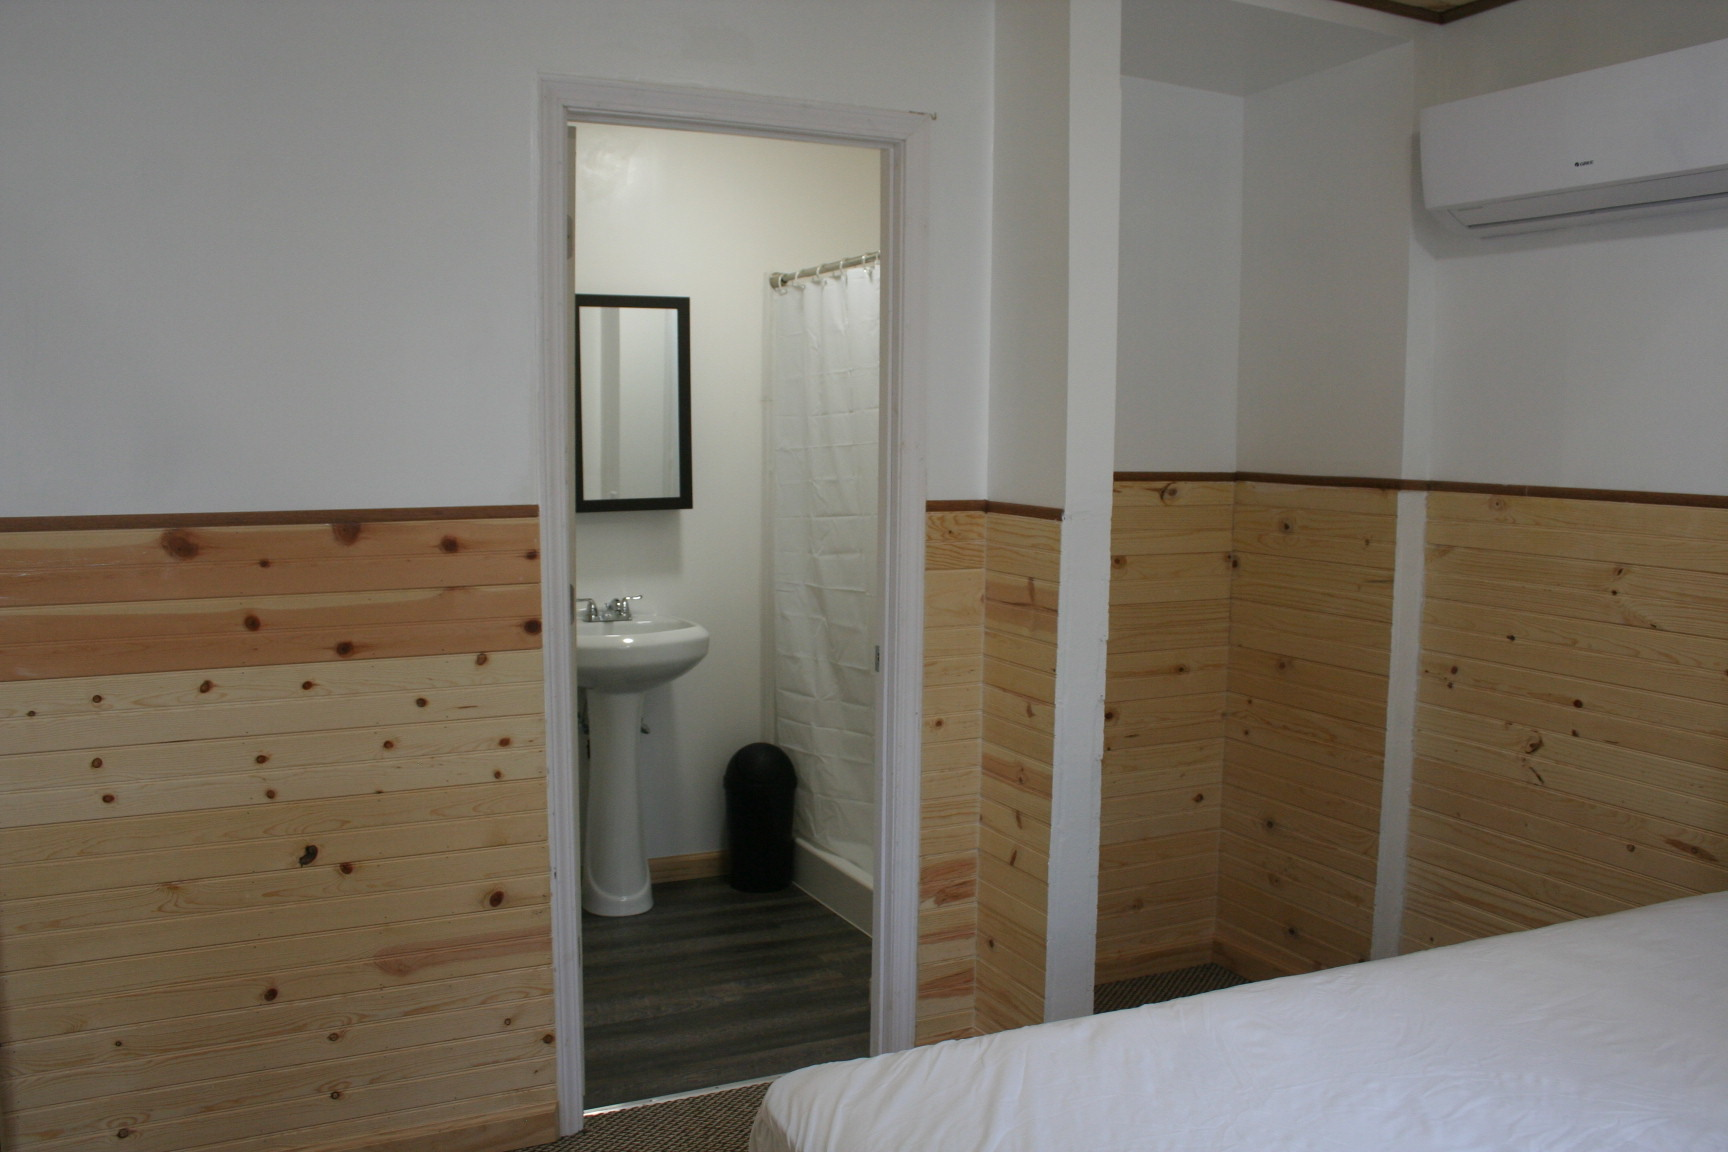 Bedroom looking into Bathroom in Cabin #2